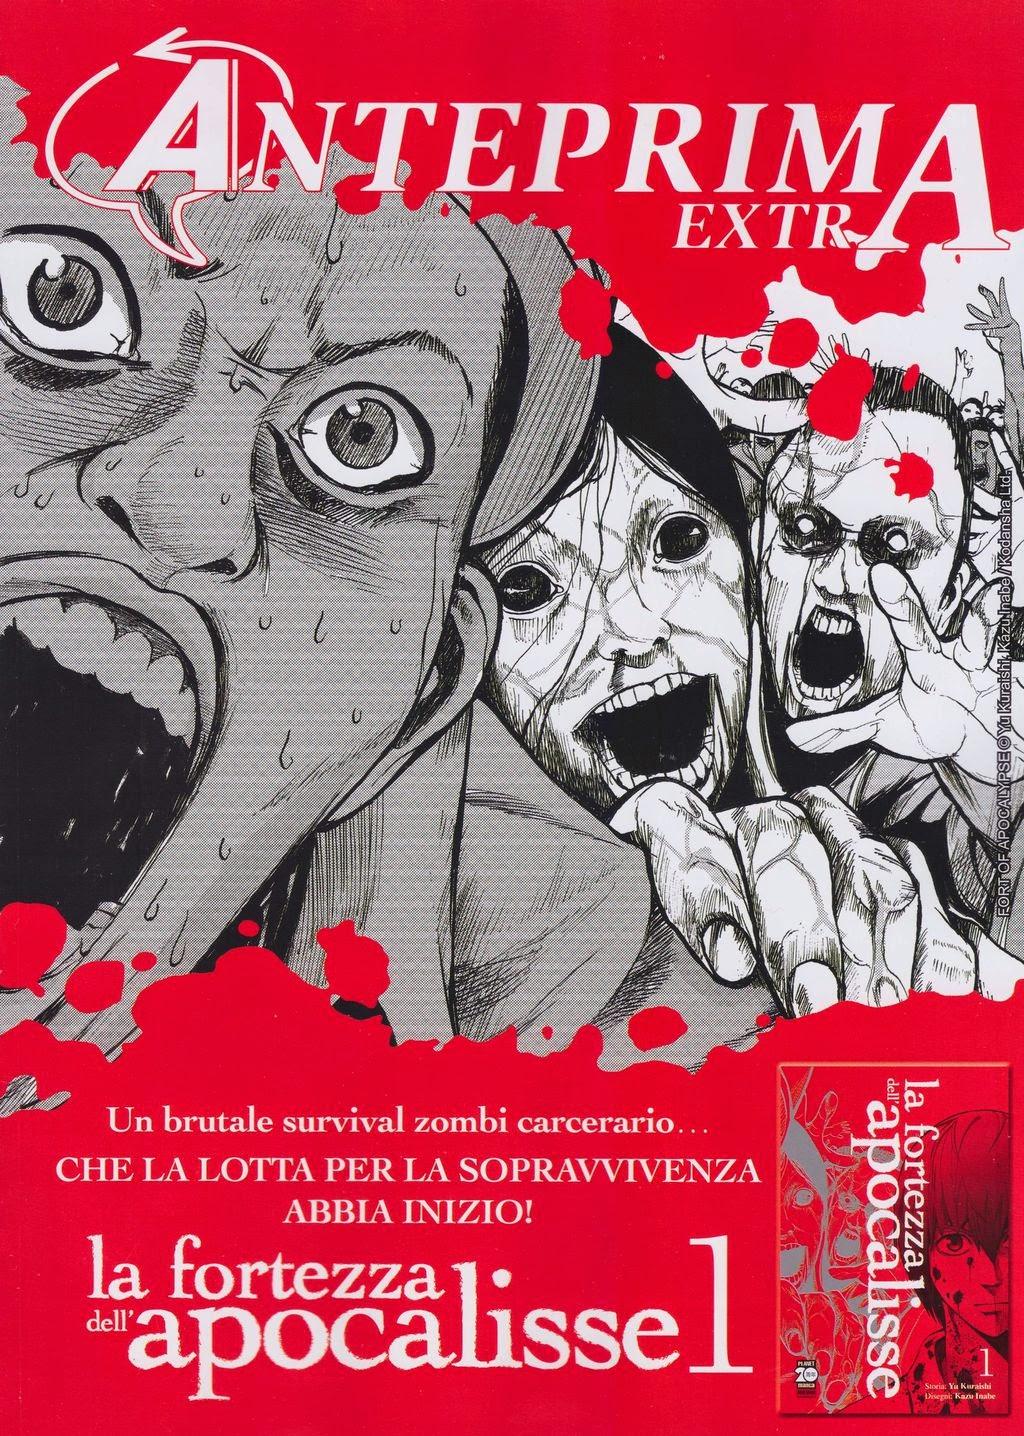 Anteprima #284 Extra (cover)